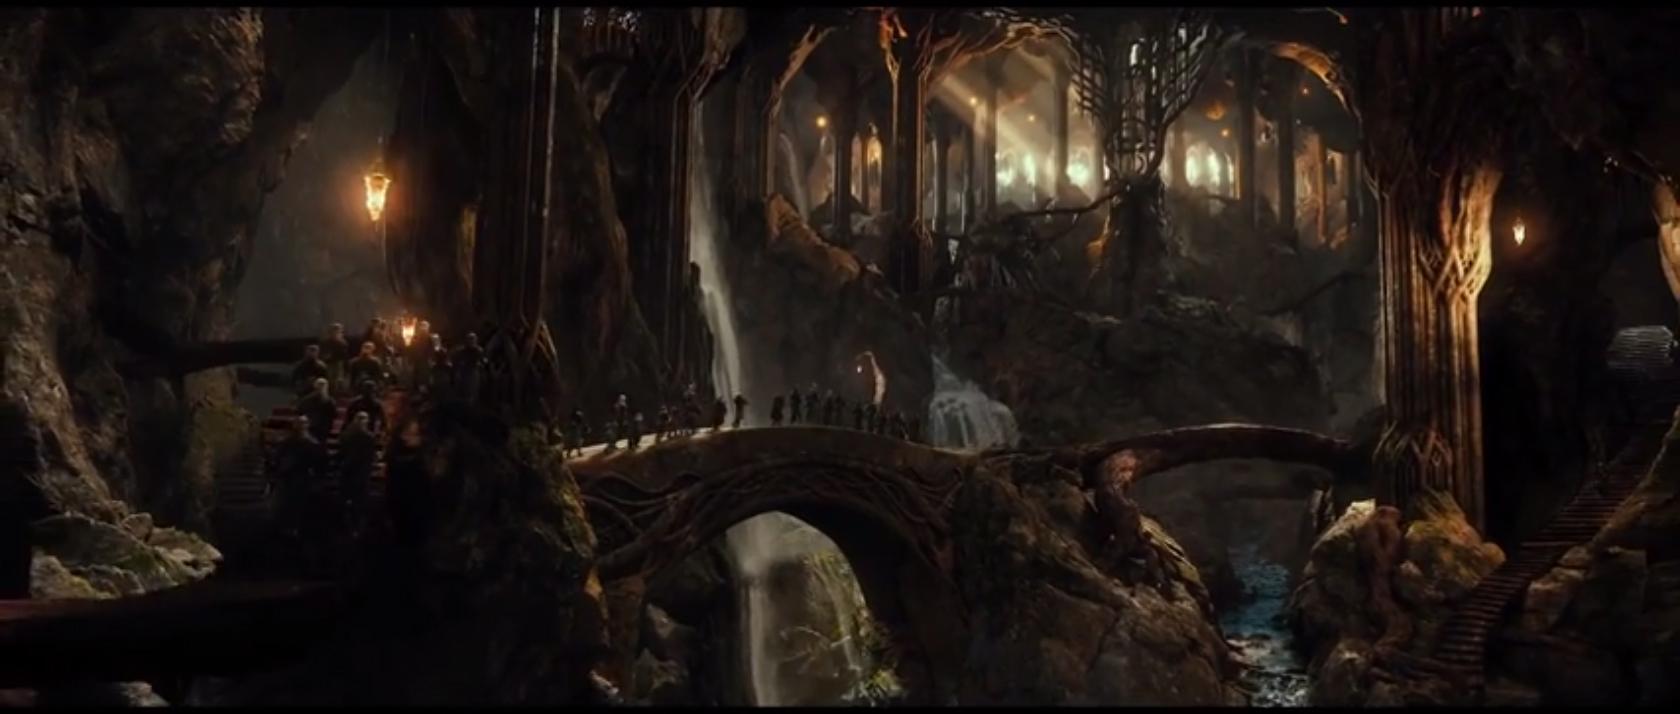 http://timsfilmreviews.files.wordpress.com/2013/06/the-hobbit-the-desolation-of-smaug-mirkwood.jpg